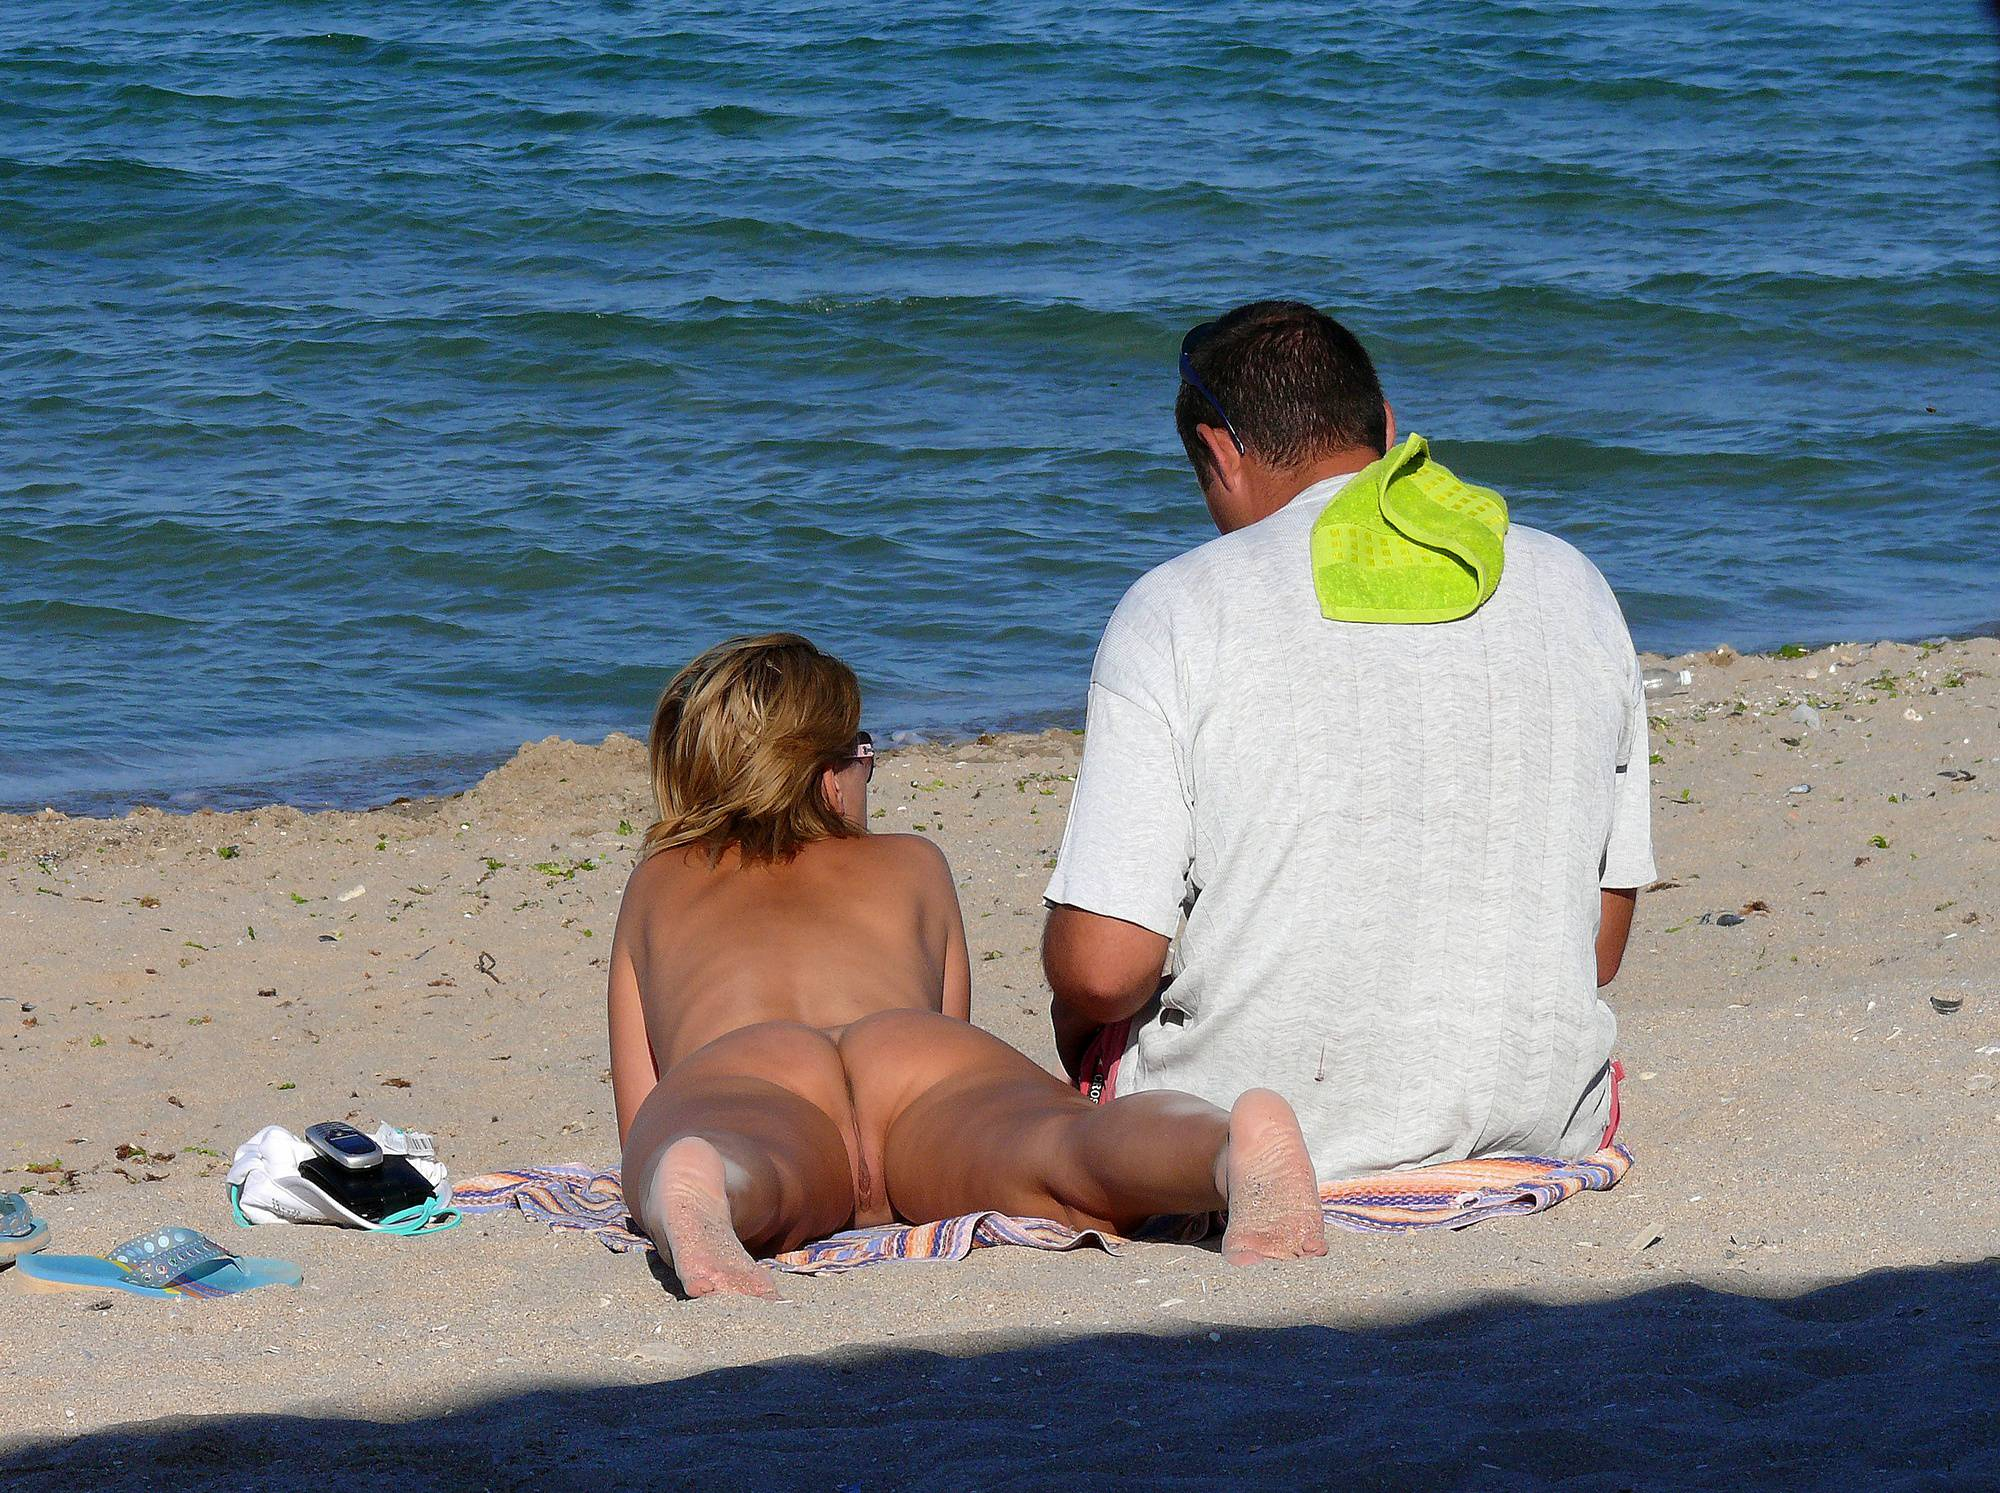 Purenudism Images-Romanian Beach Voyeur - 4